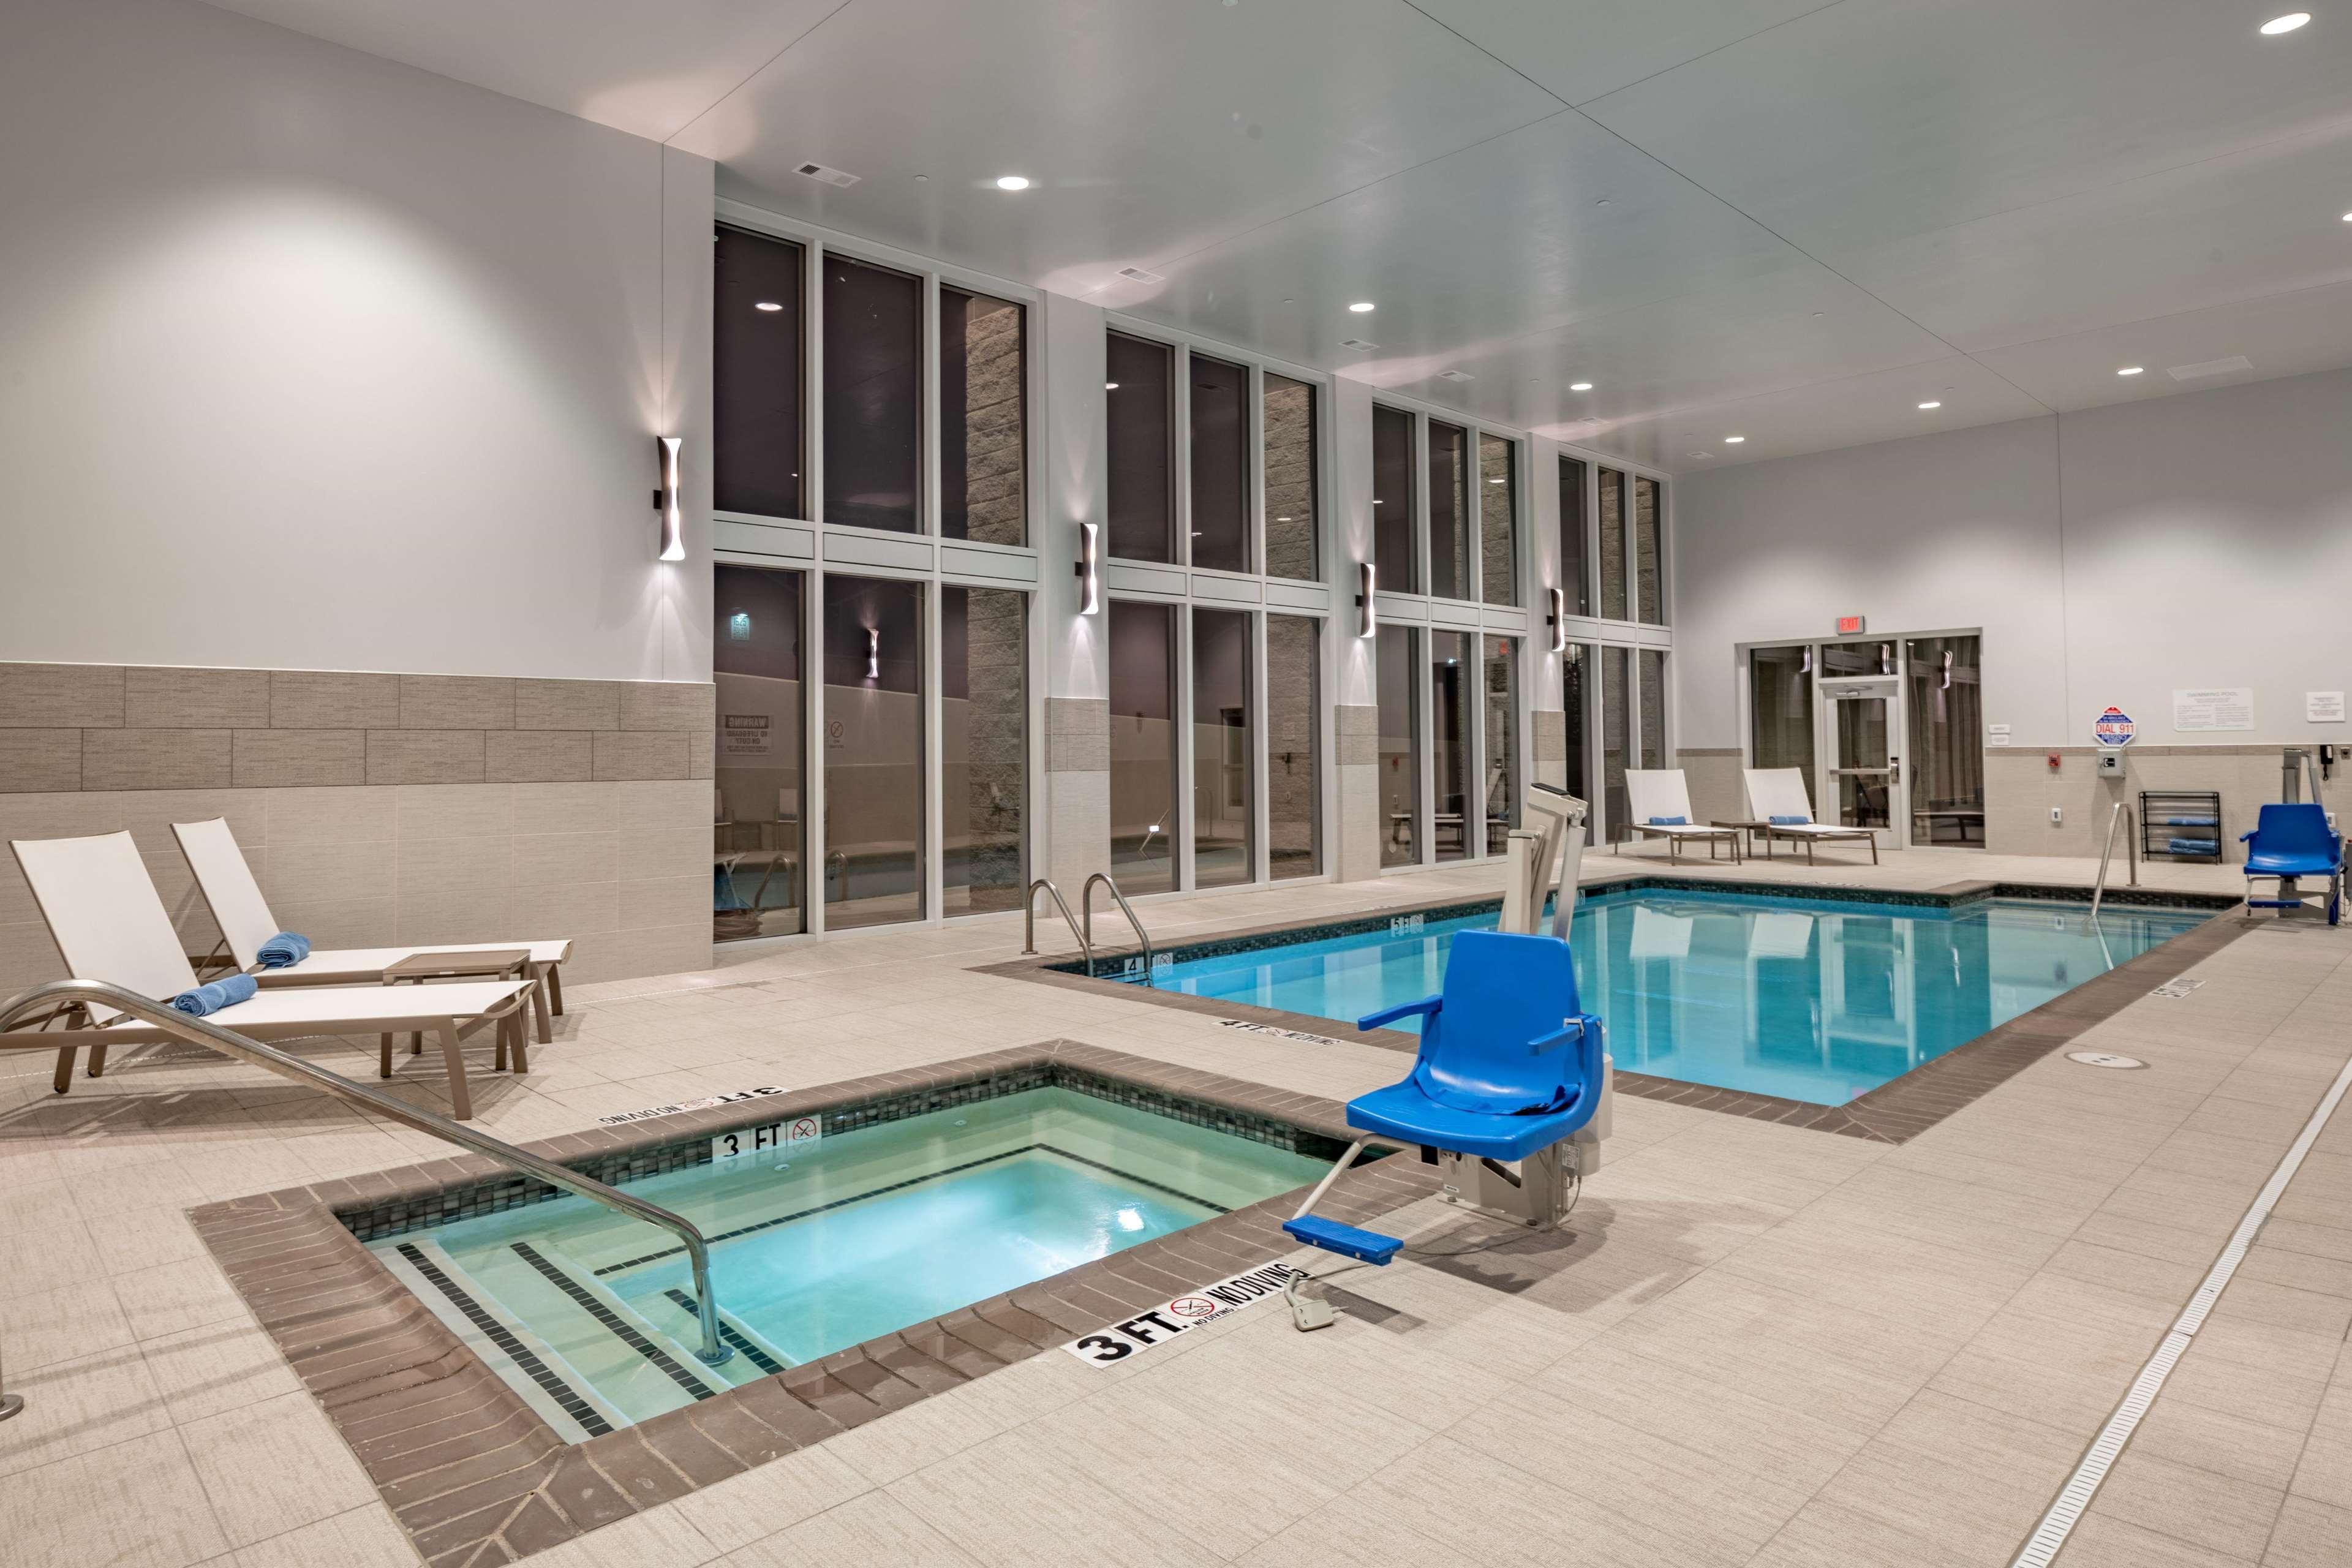 Hilton Garden Inn Dallas at Hurst Conference Center image 13